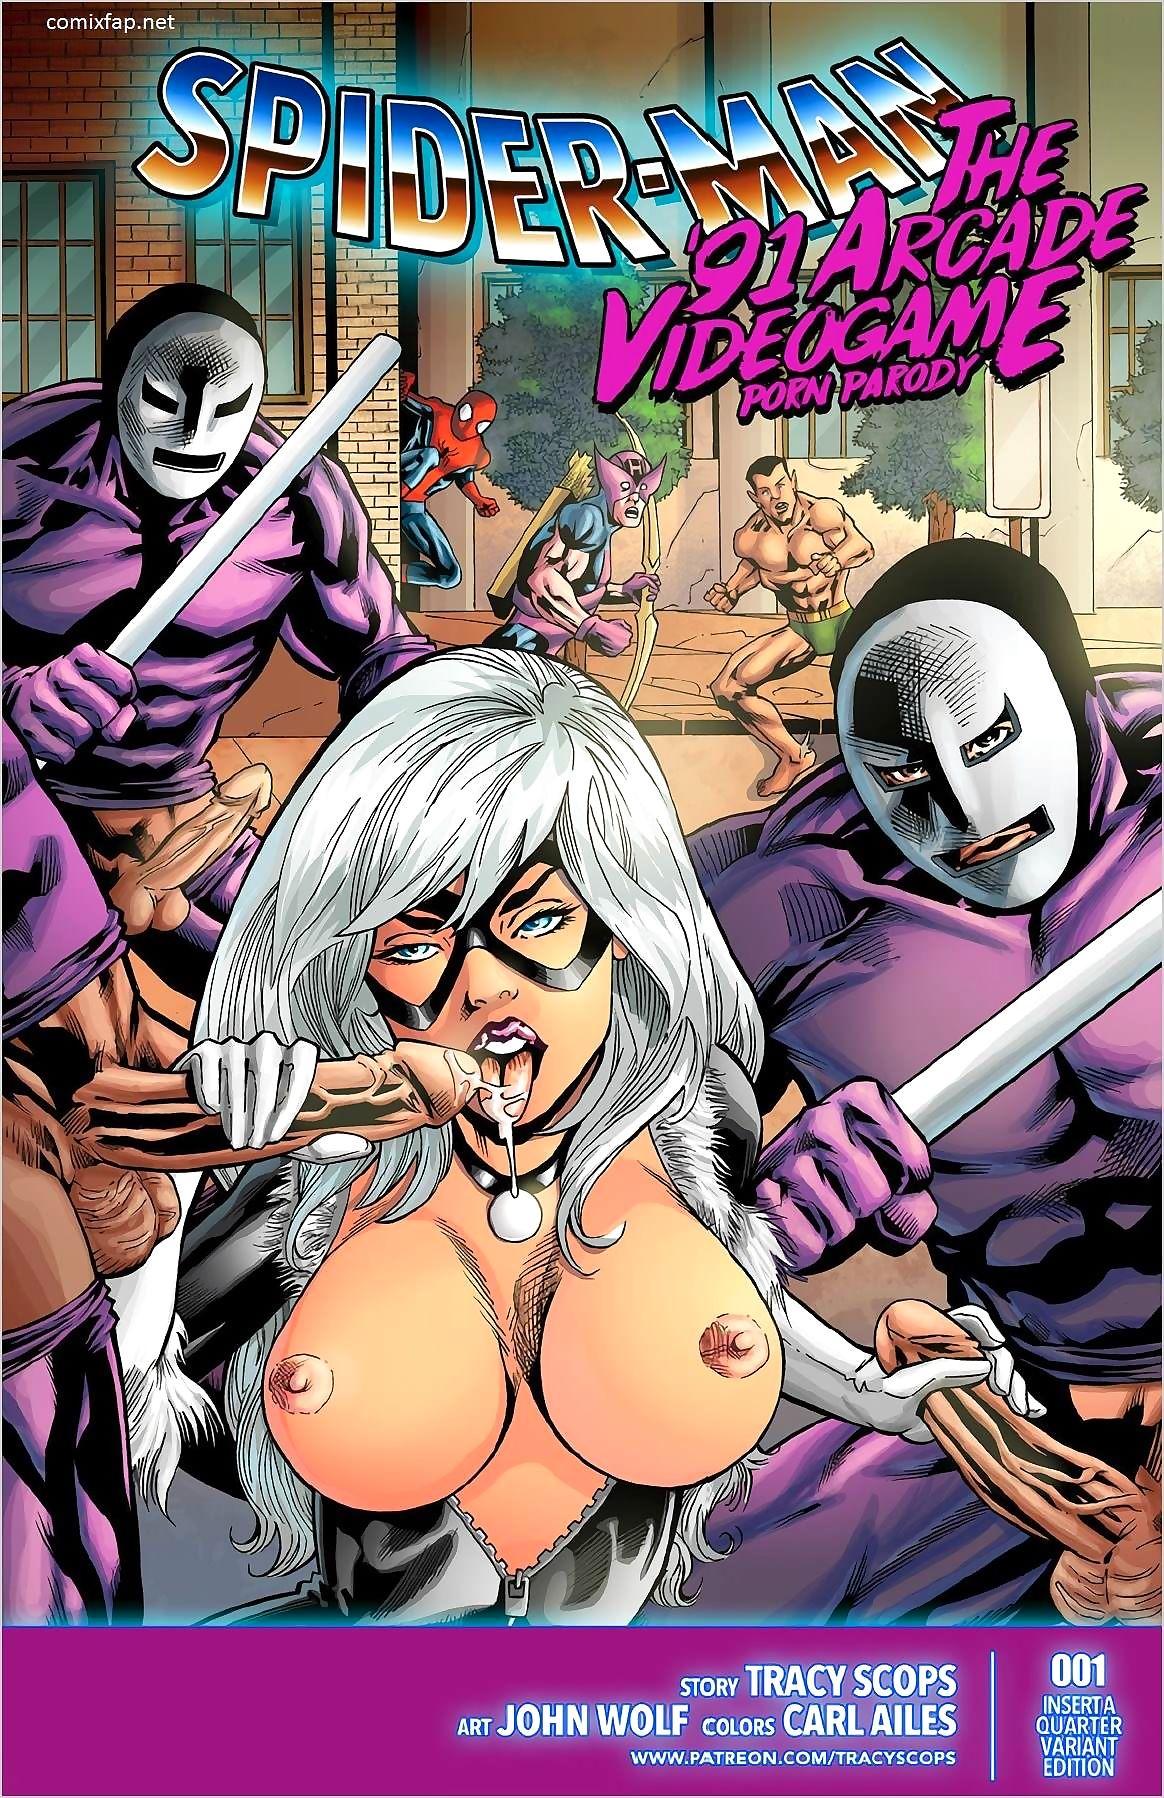 Tracy Scops- Spiderman, slay rub elbows with '91 arcade divertissement